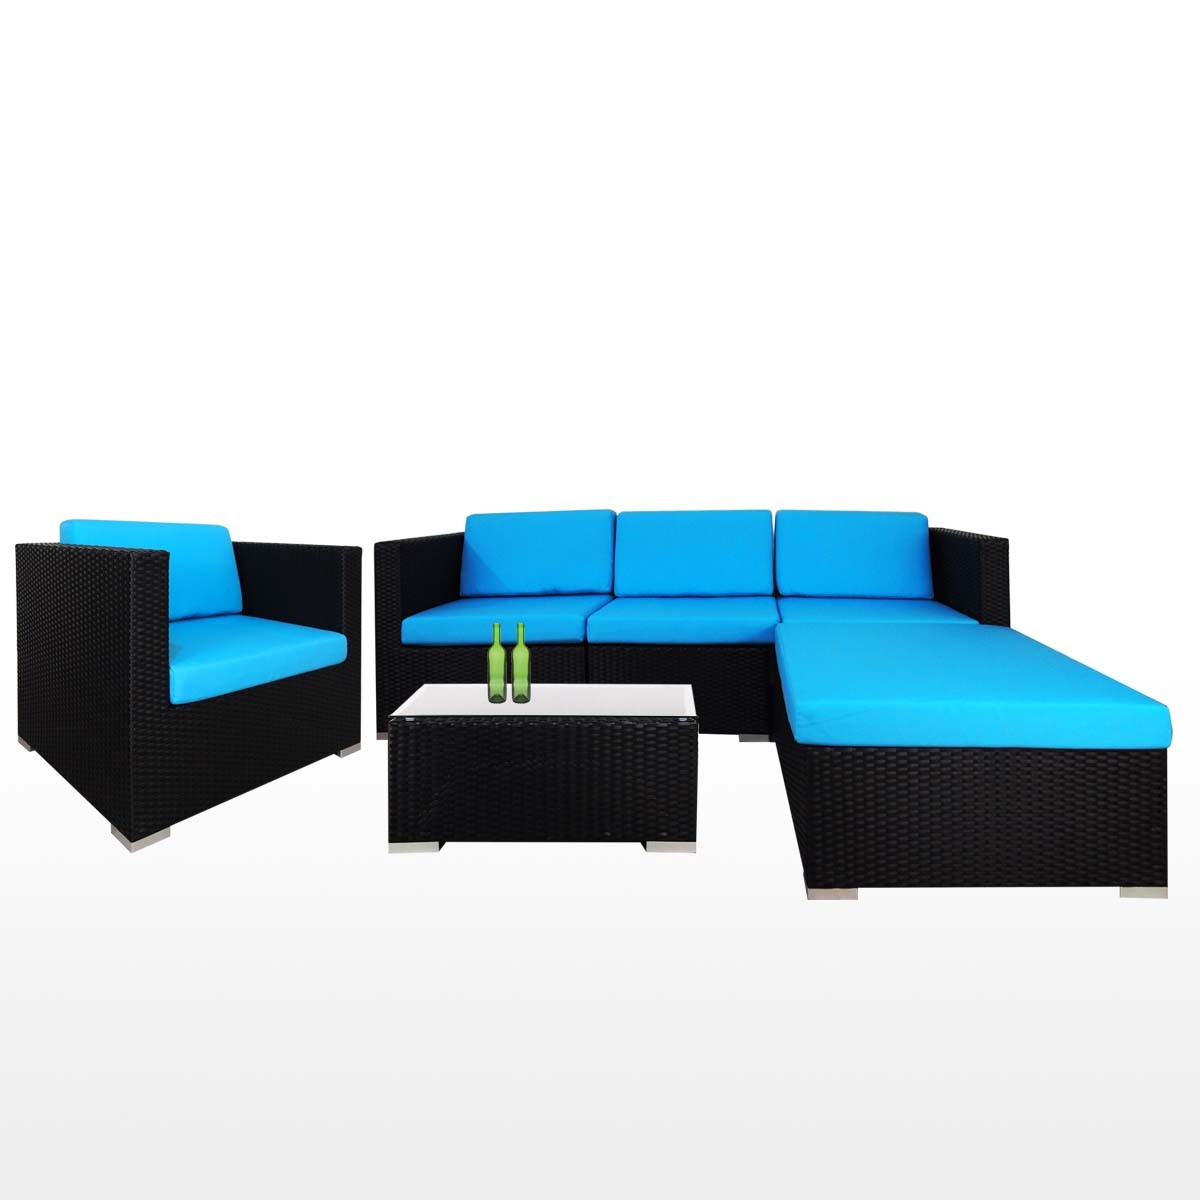 Modular Outdoor Kitchen Units: Summer Outdoor Modular Sofa Set II Blue Cushions (2 Year